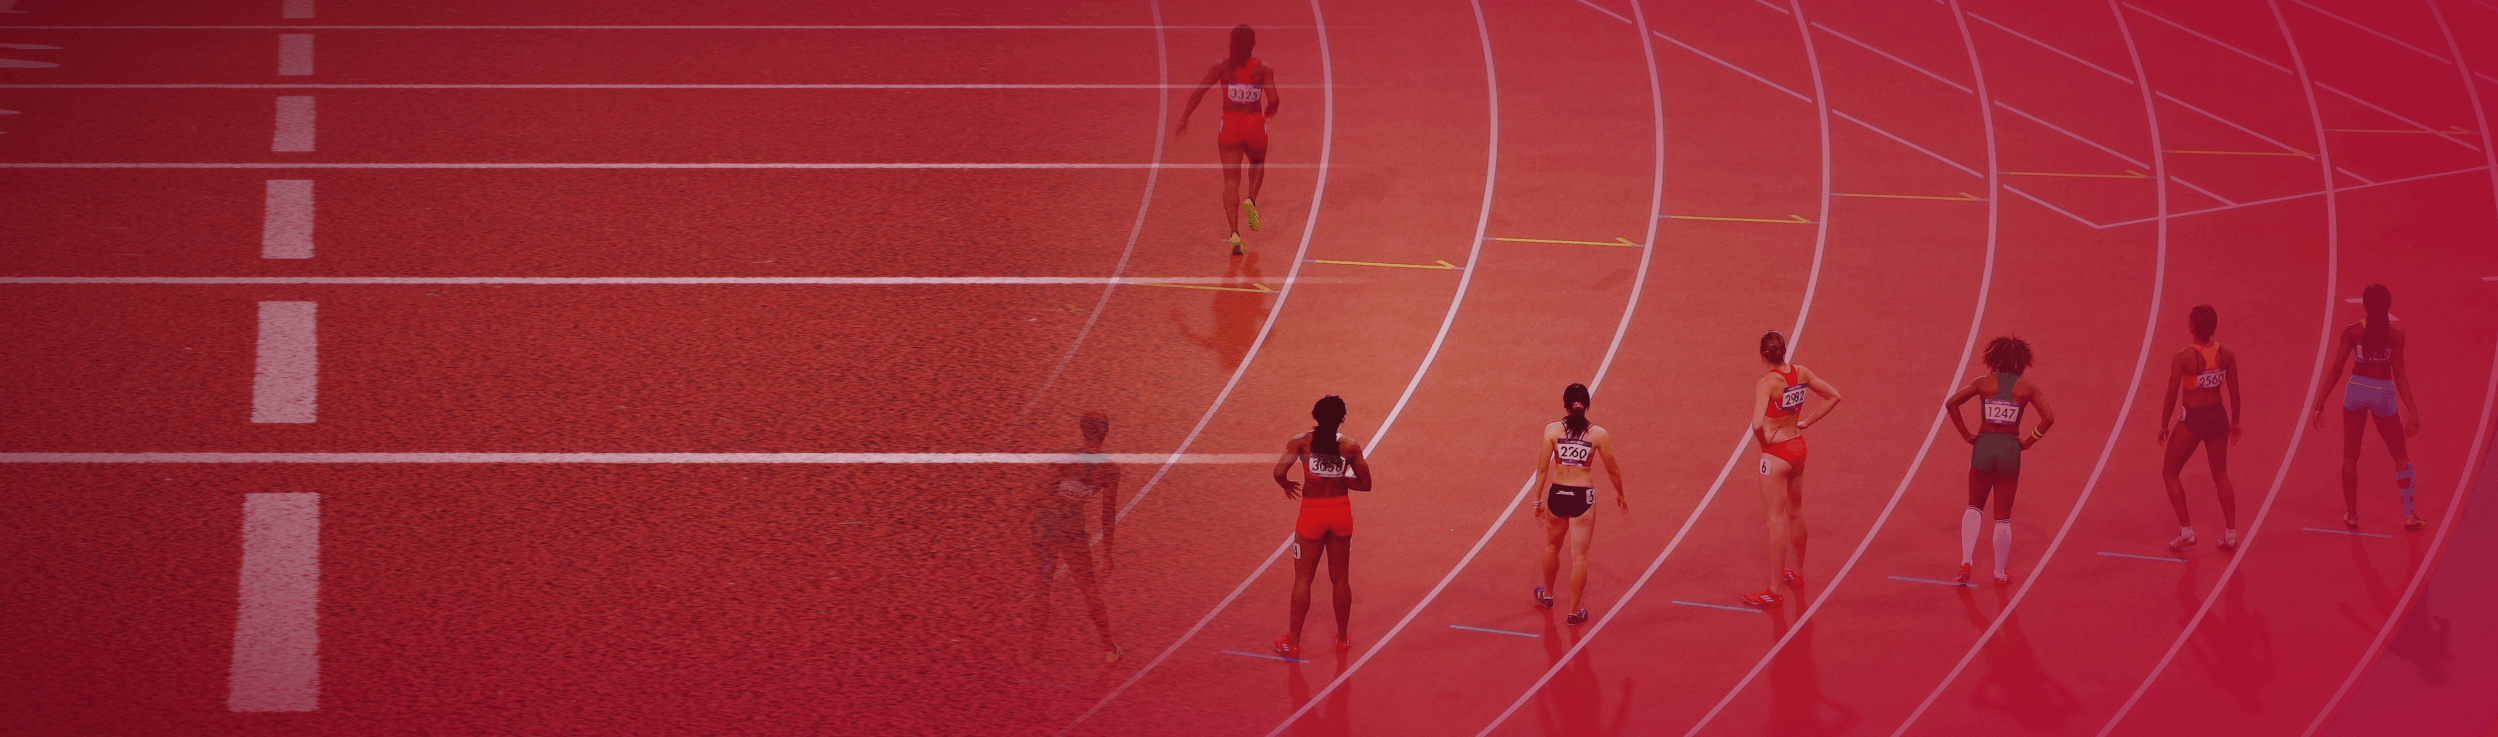 Athletics Data Feed Coverage